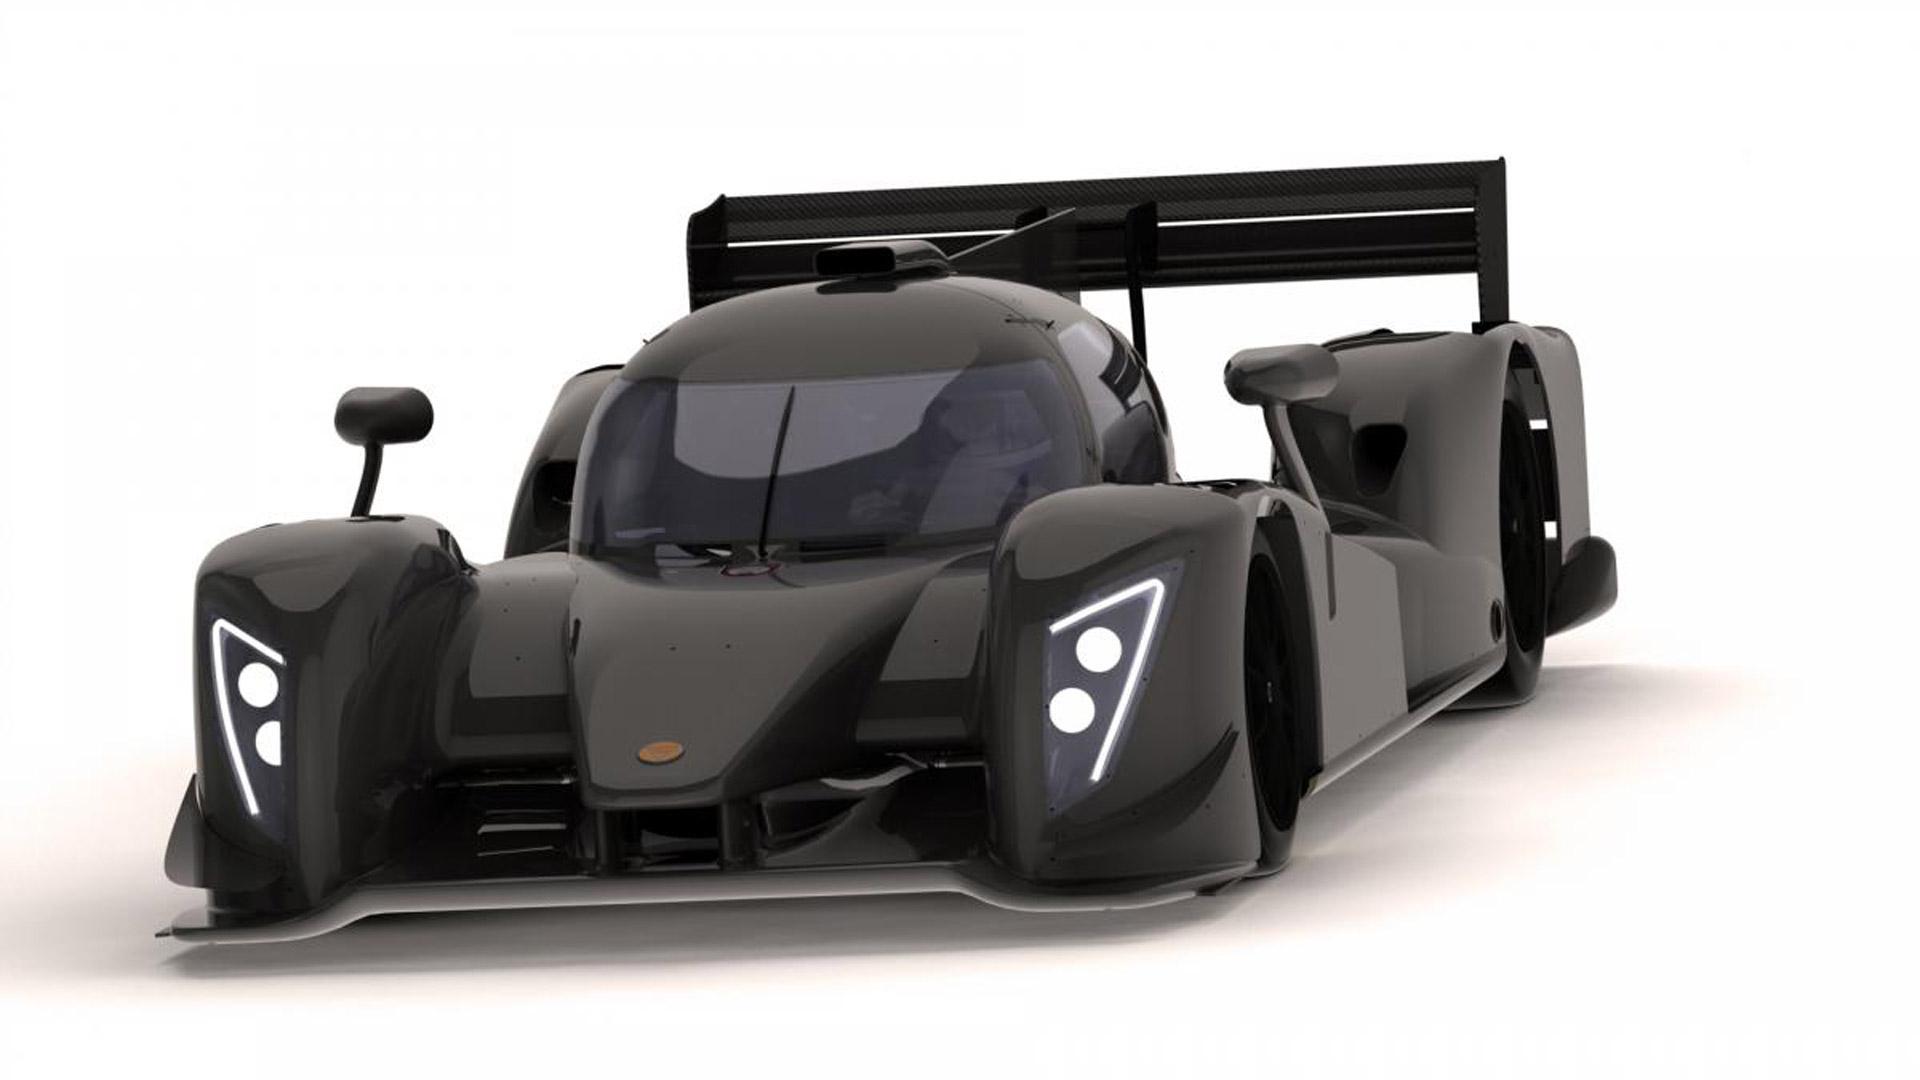 LS3-Powered Ginetta G57 Prototype Racer Revealed